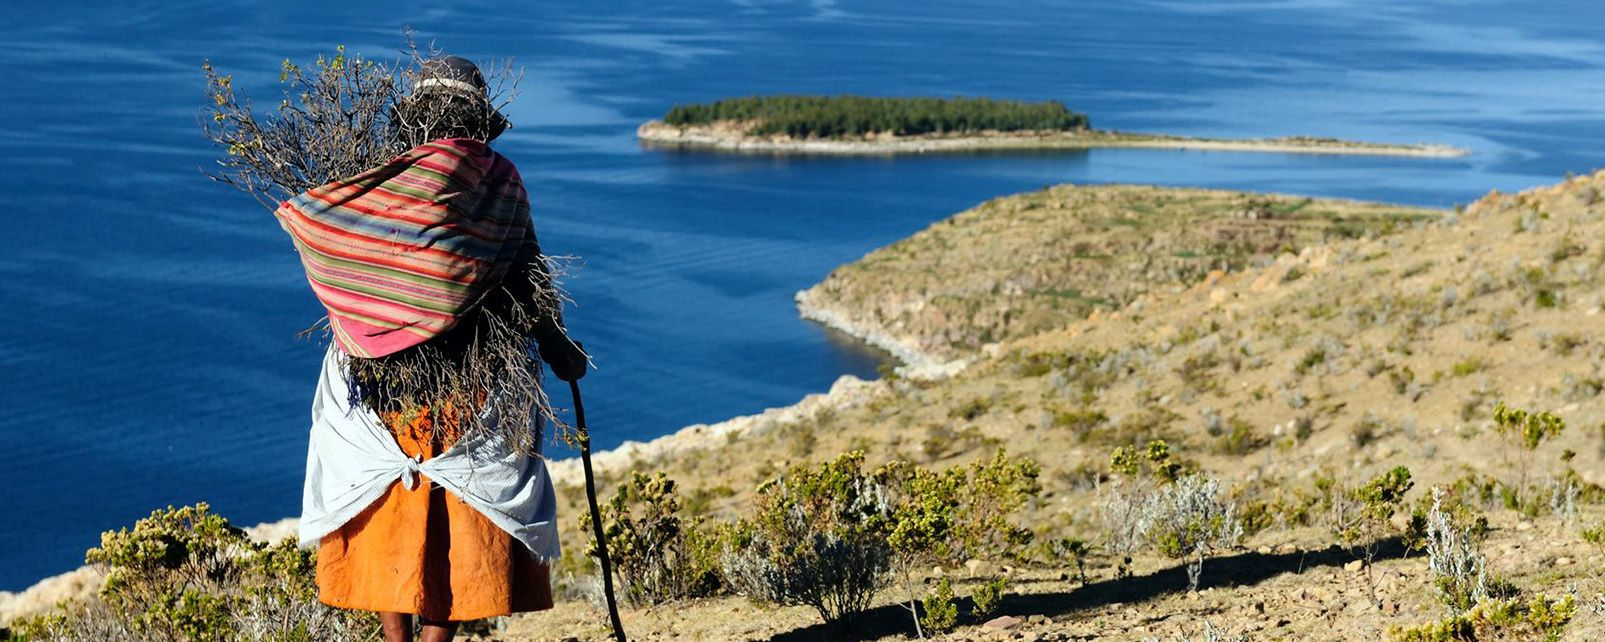 Le lac Titikaka , Lac Titicaca , Bolivie